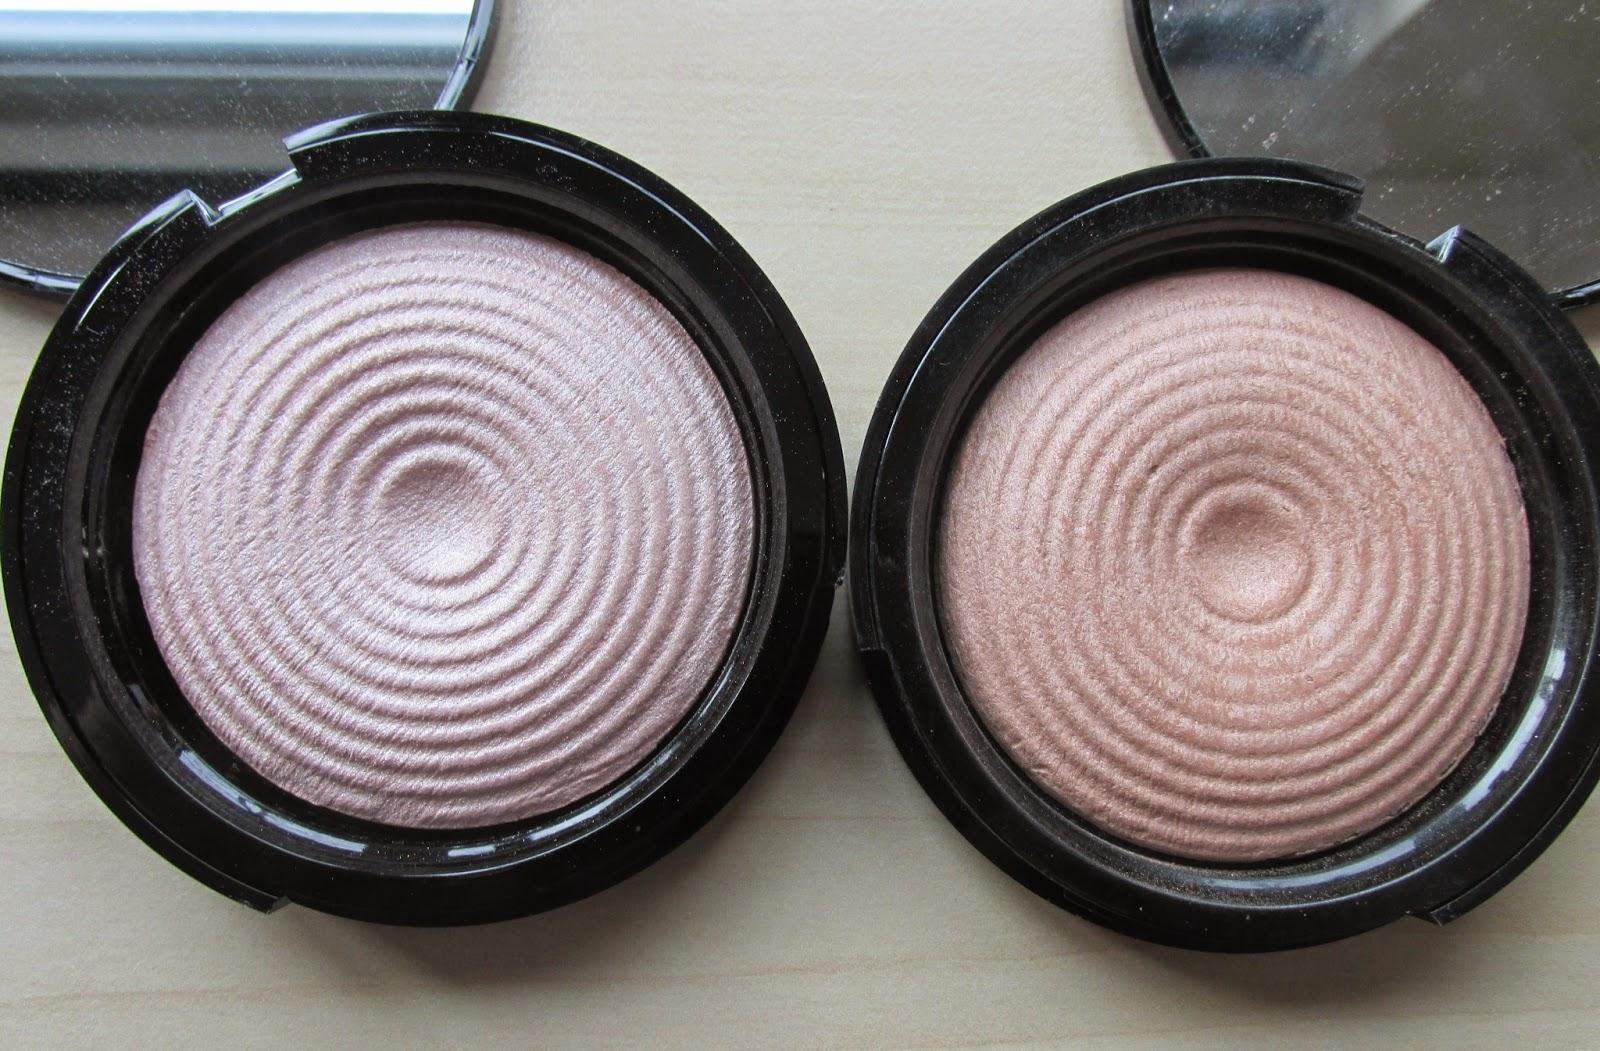 Makeup revolution radiant lights powder